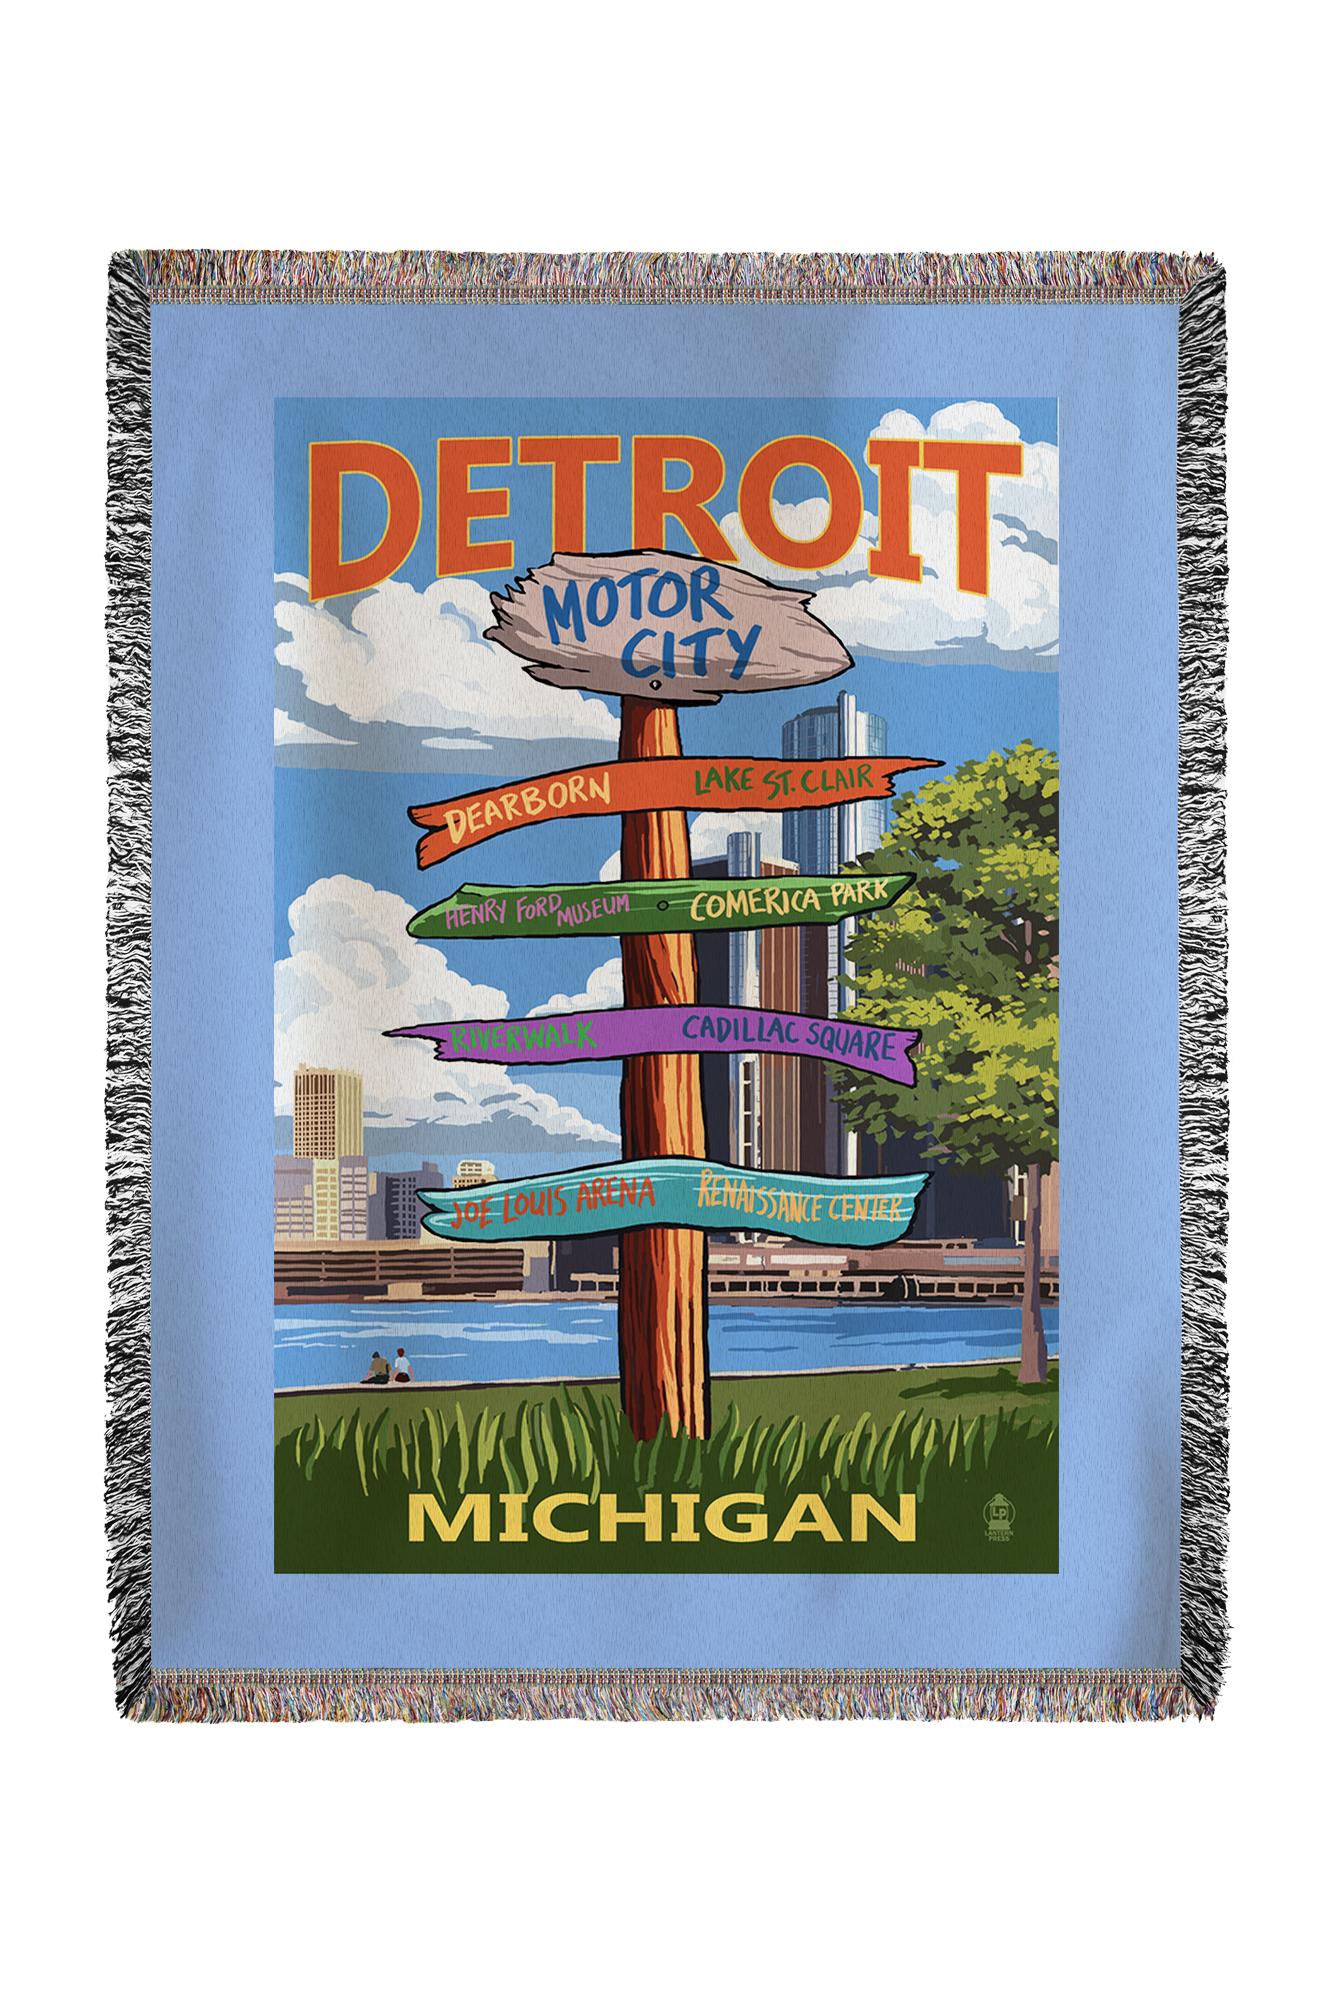 Detroit, Michigan Sign Post Lantern Press Artwork (60x80 Woven Chenille Yarn Blanket) by Lantern Press